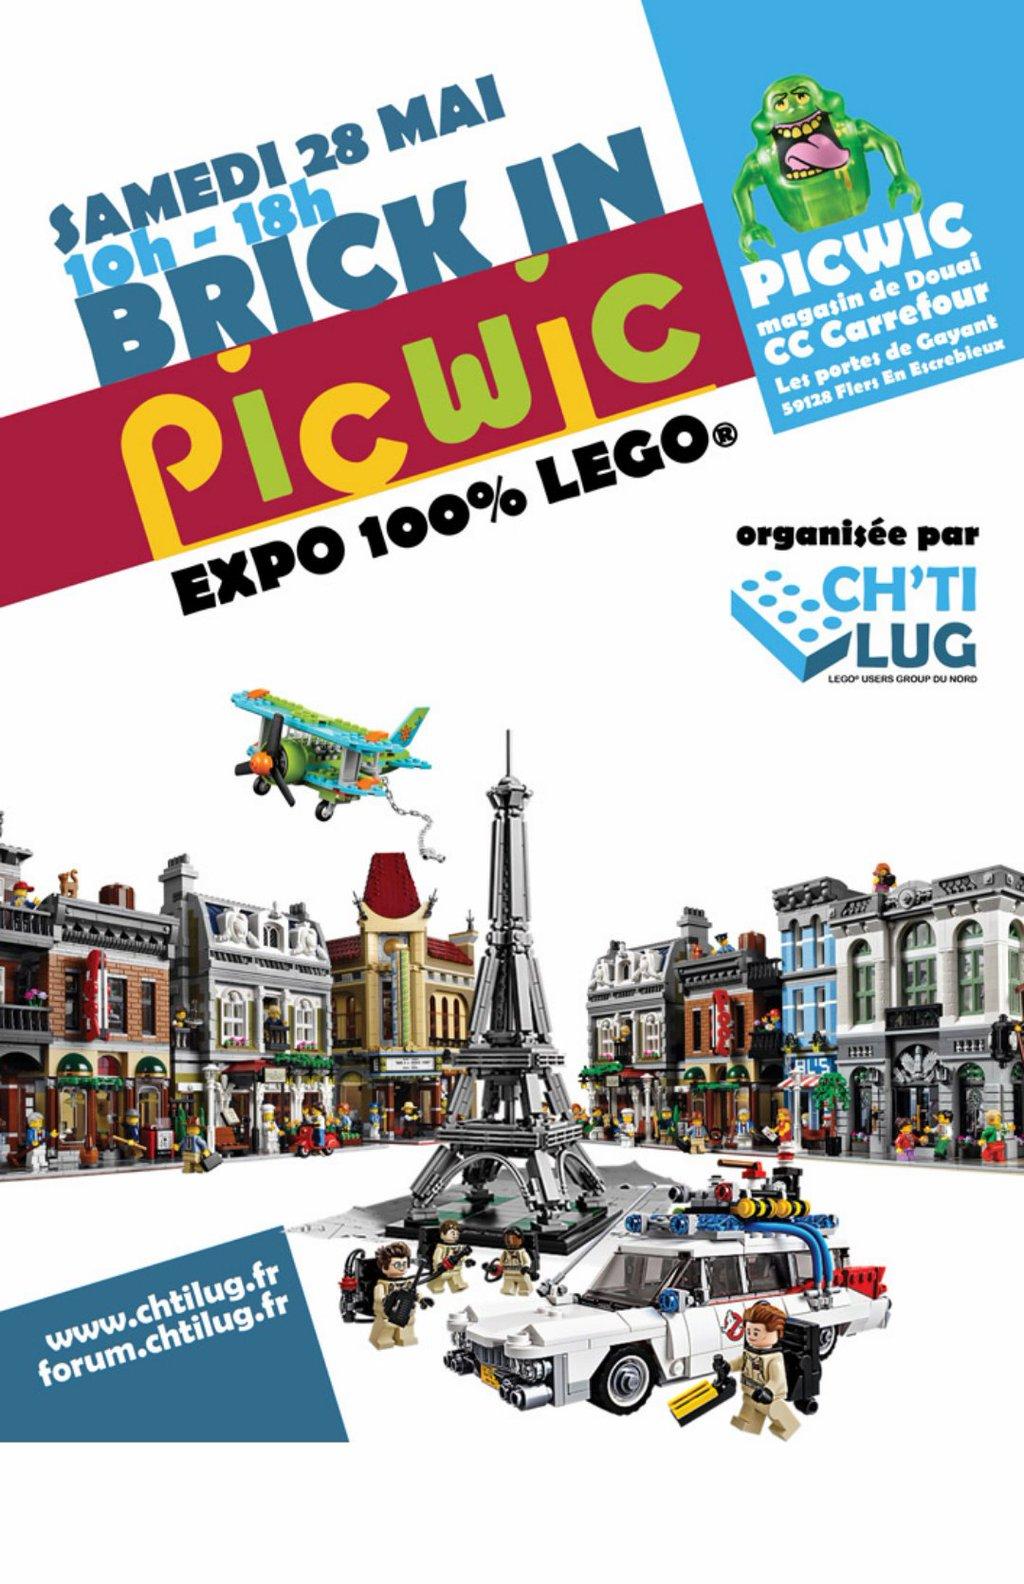 Picwic lievin edition numrique des abonns img img dco for Picwic melun horaires